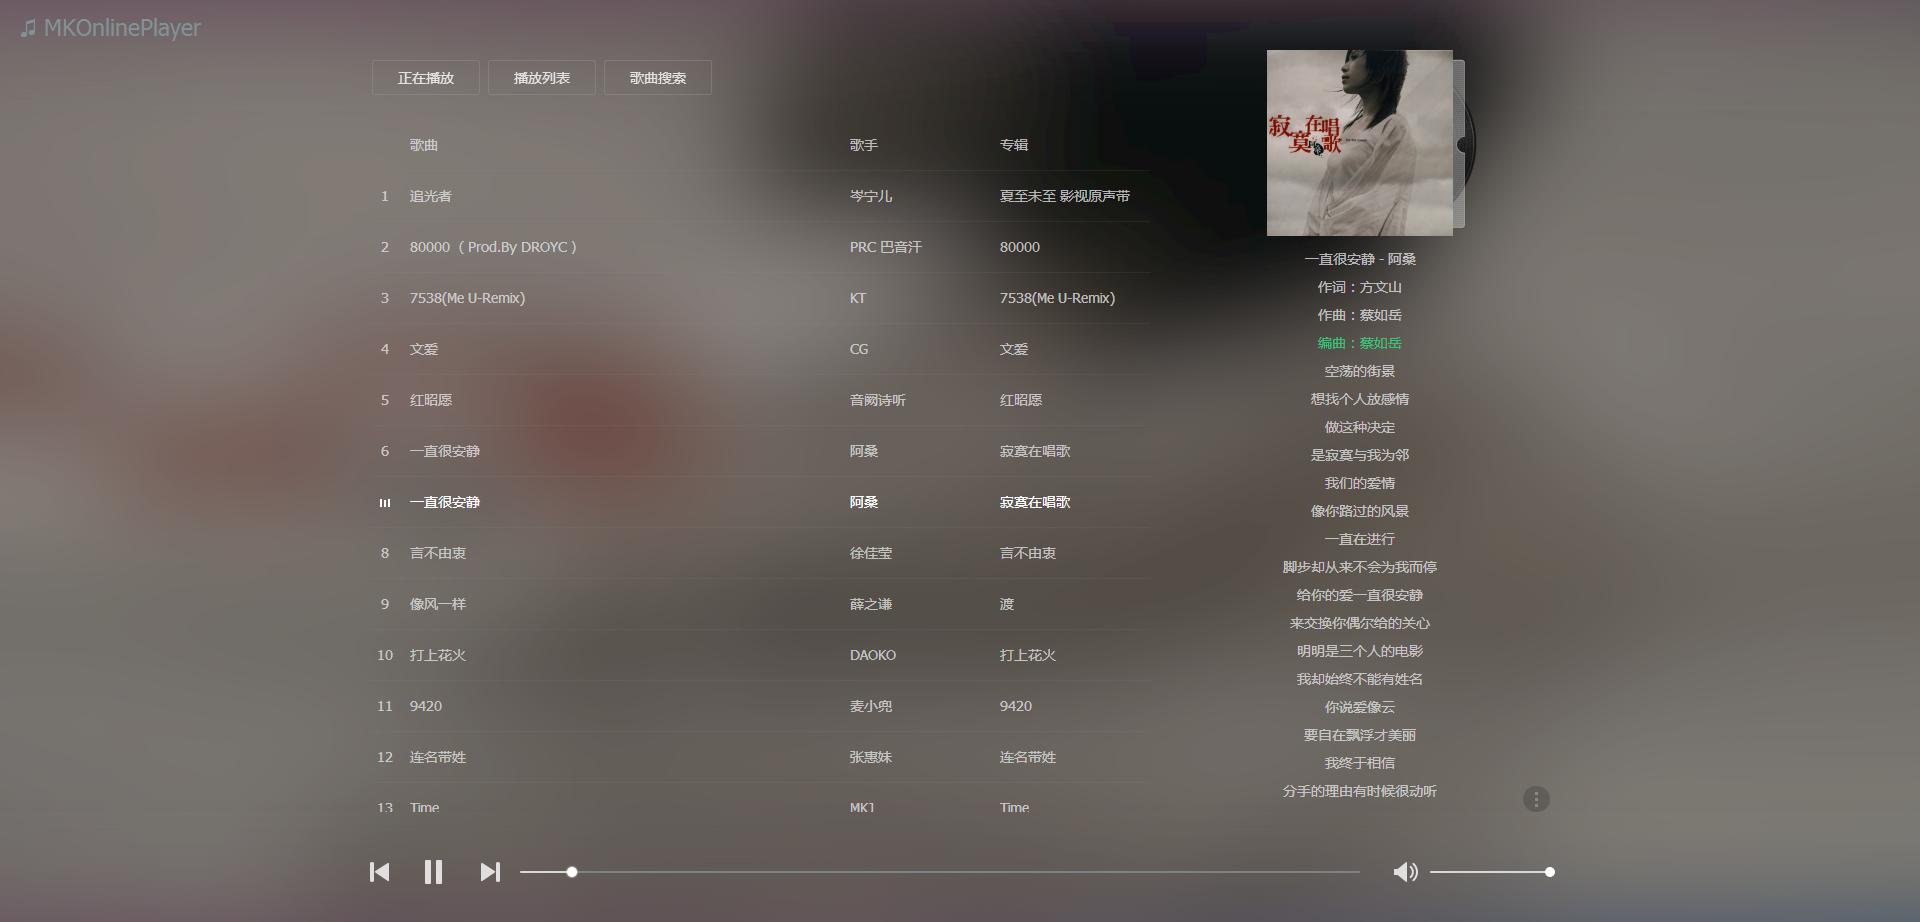 MKOnlineMusicPlayer:一款开源的基于Meting的在线音乐播放器 网站 第1张